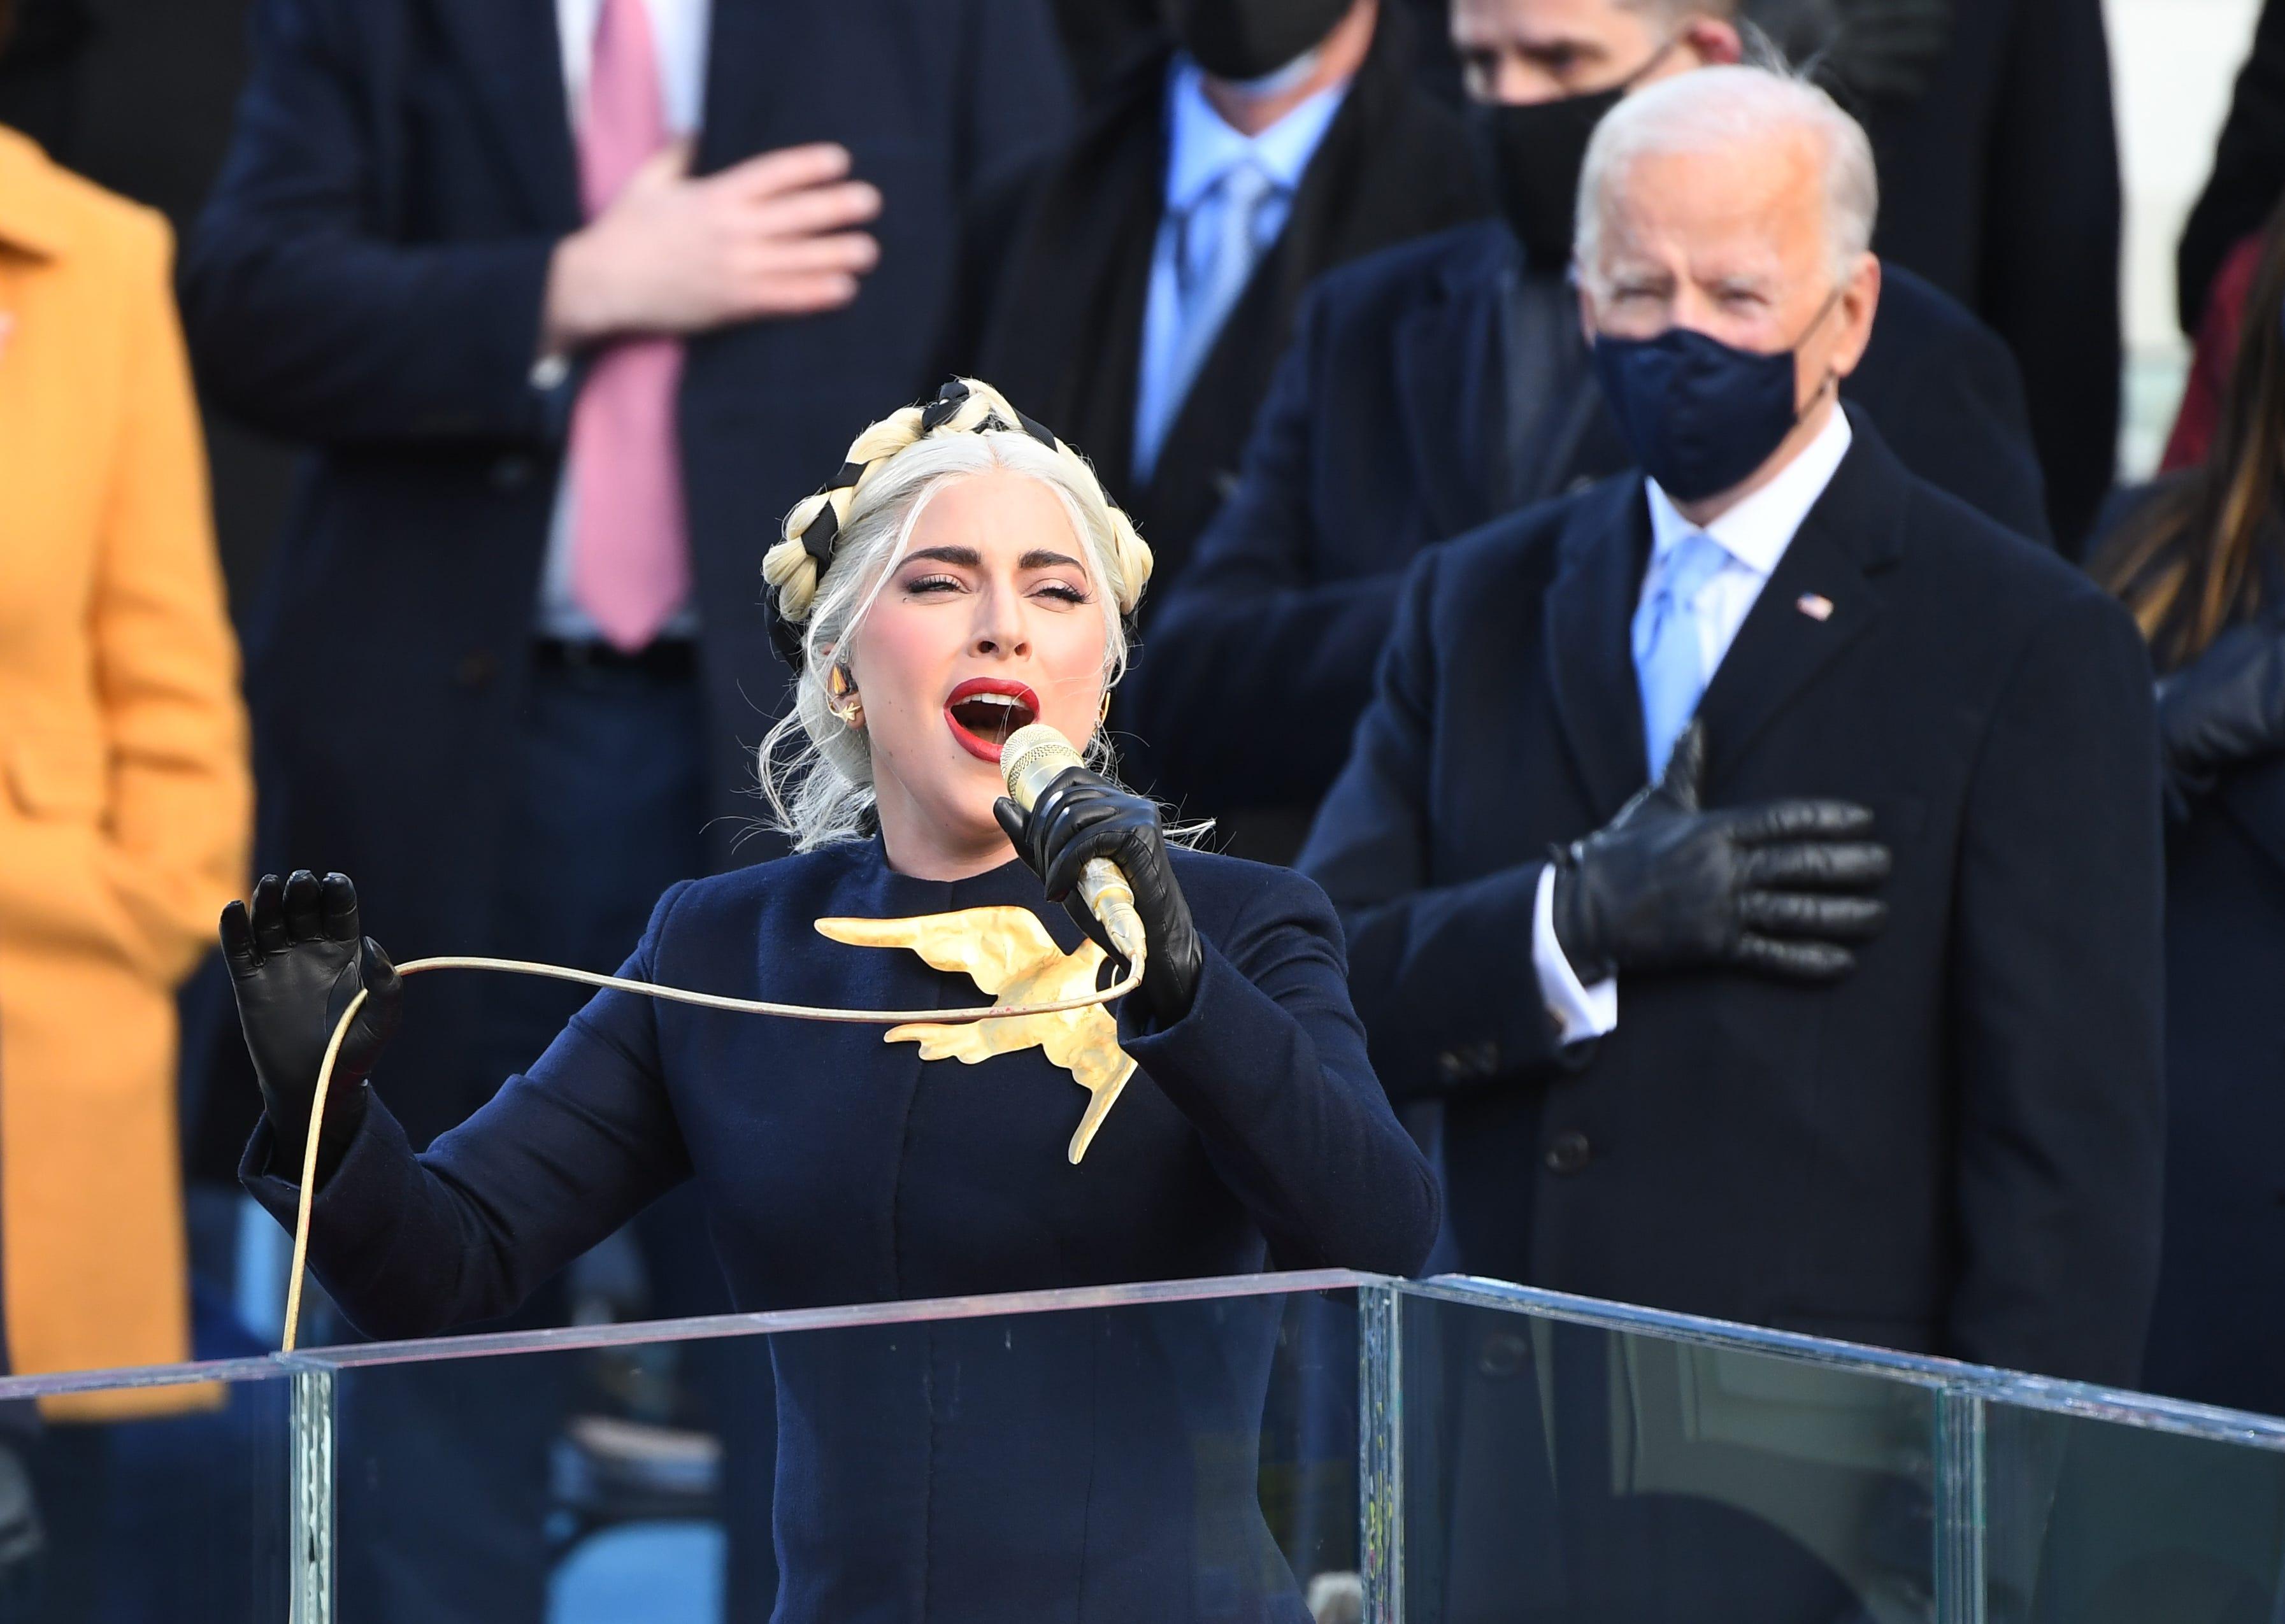 Lady Gaga inauguration national anthem performance stuns